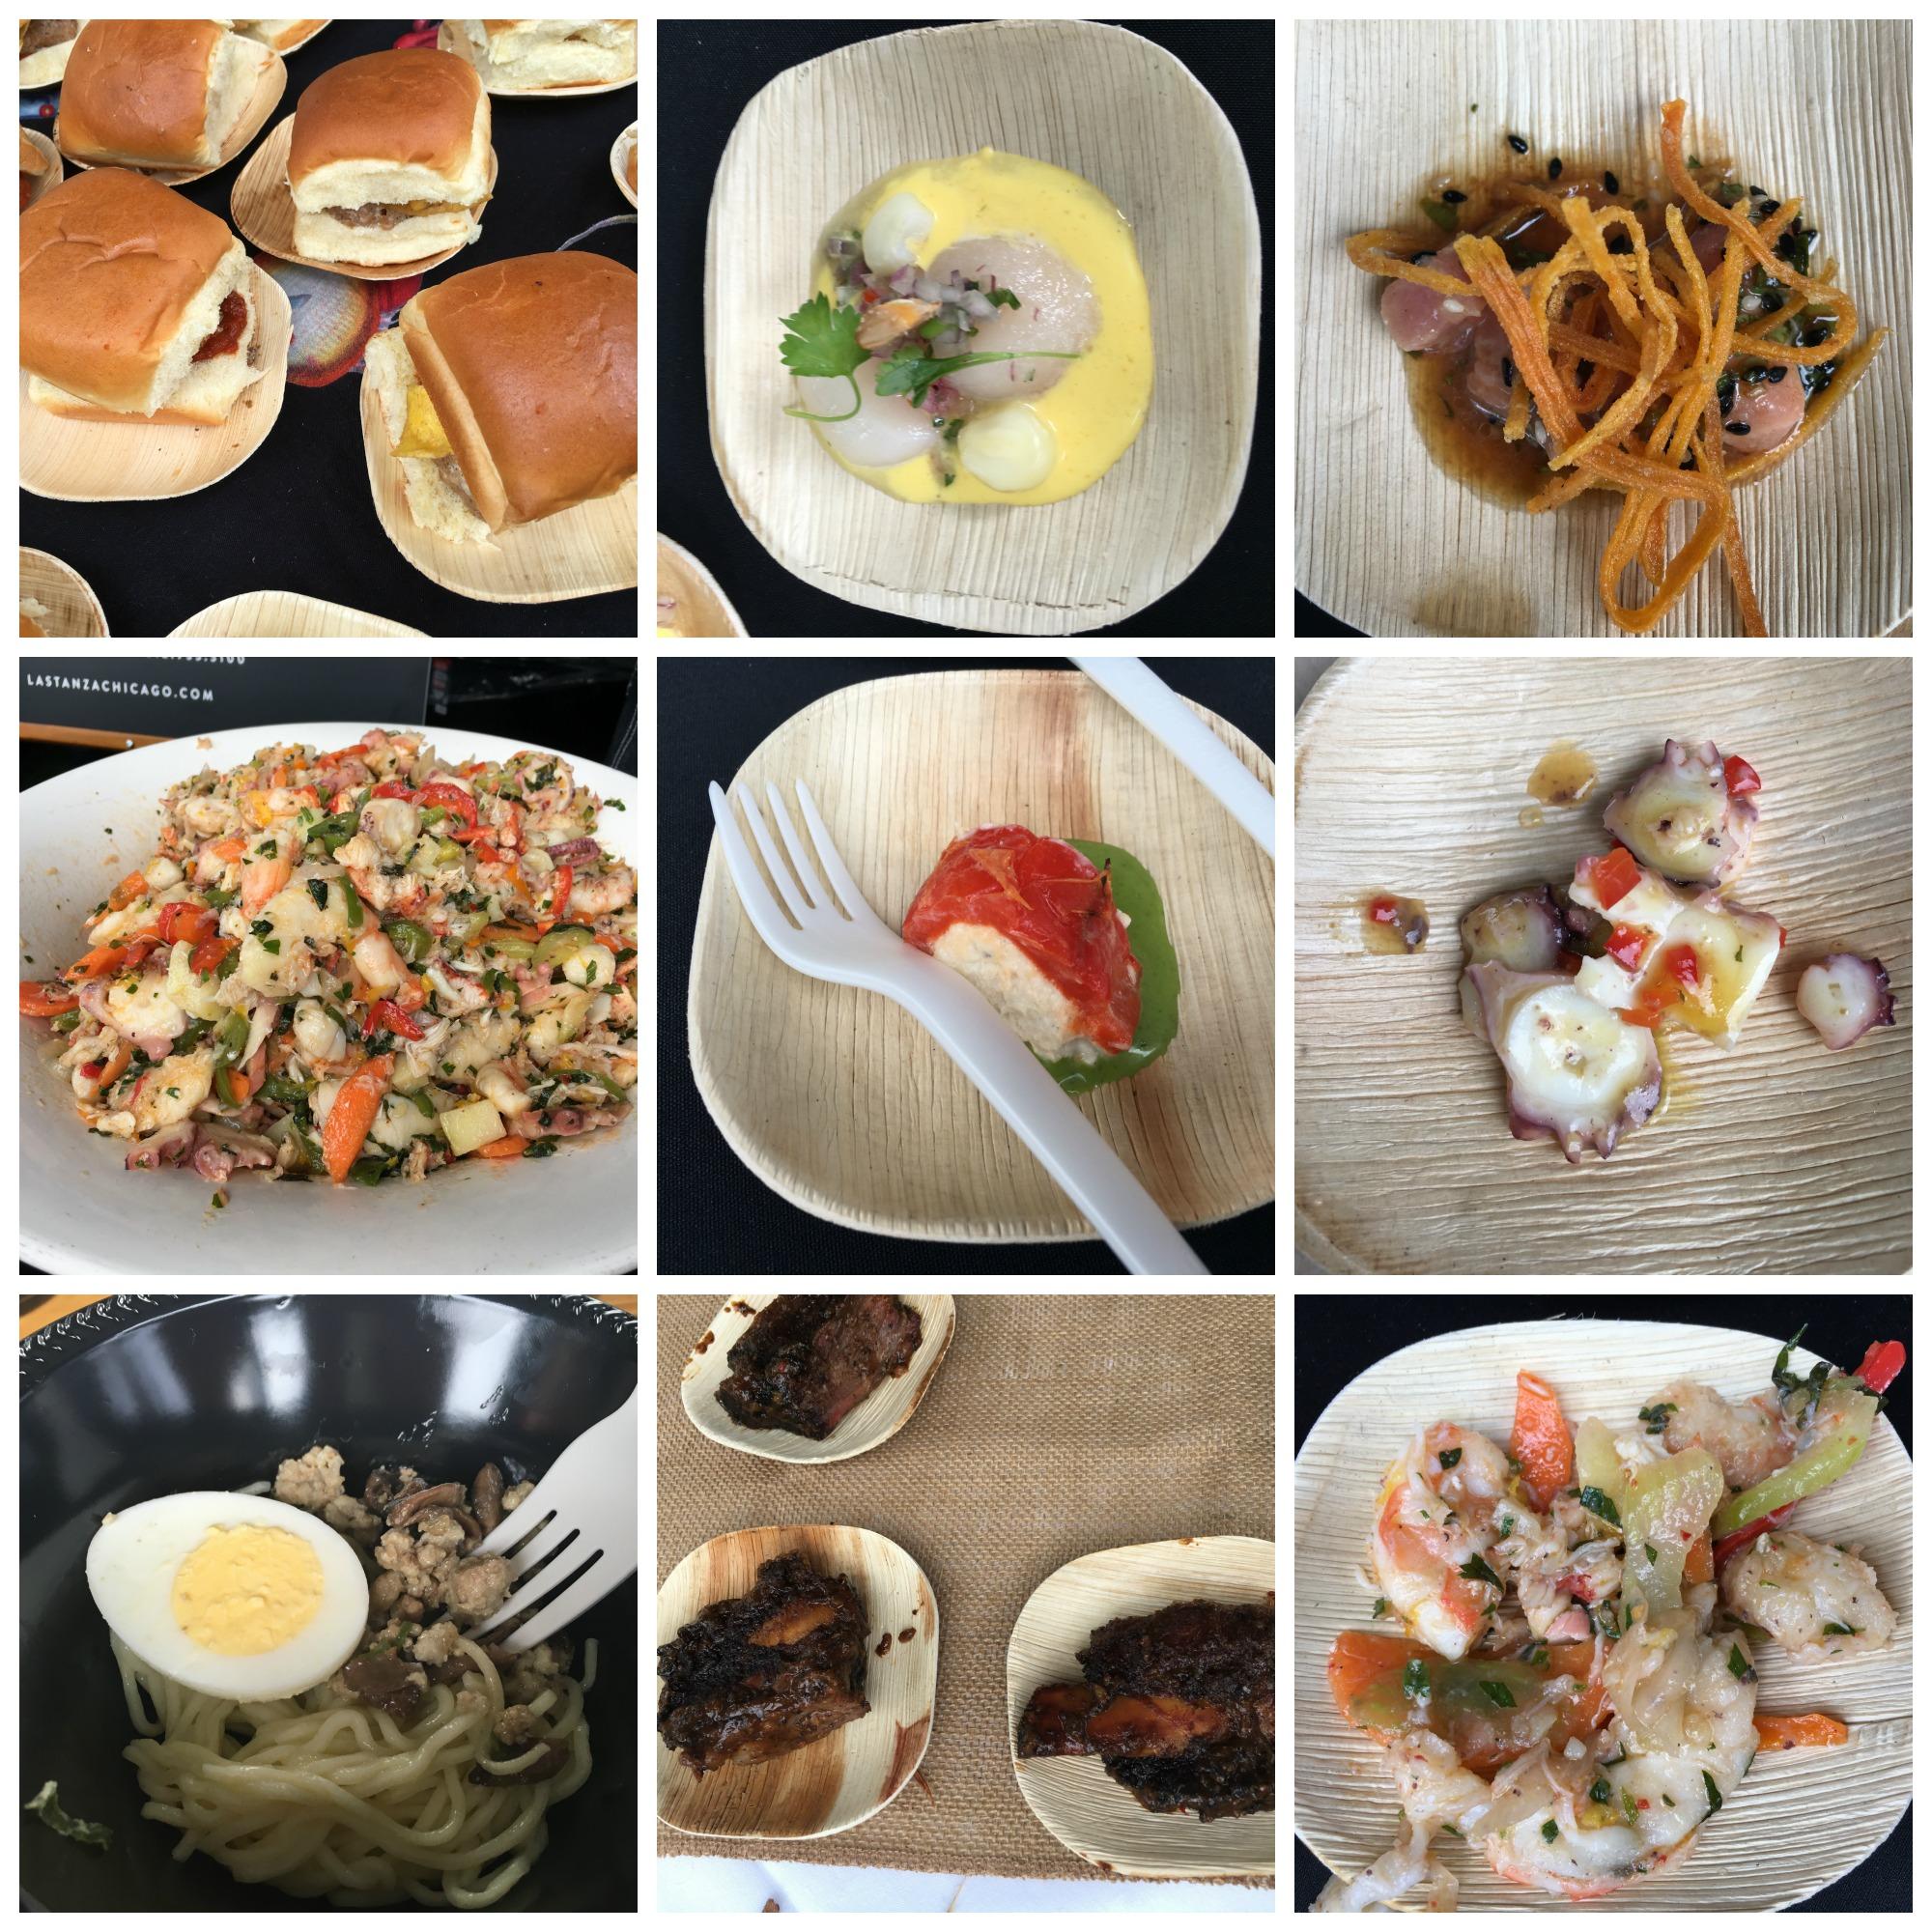 inspiringkitchen culinary heaven chicago gourmet food n wine